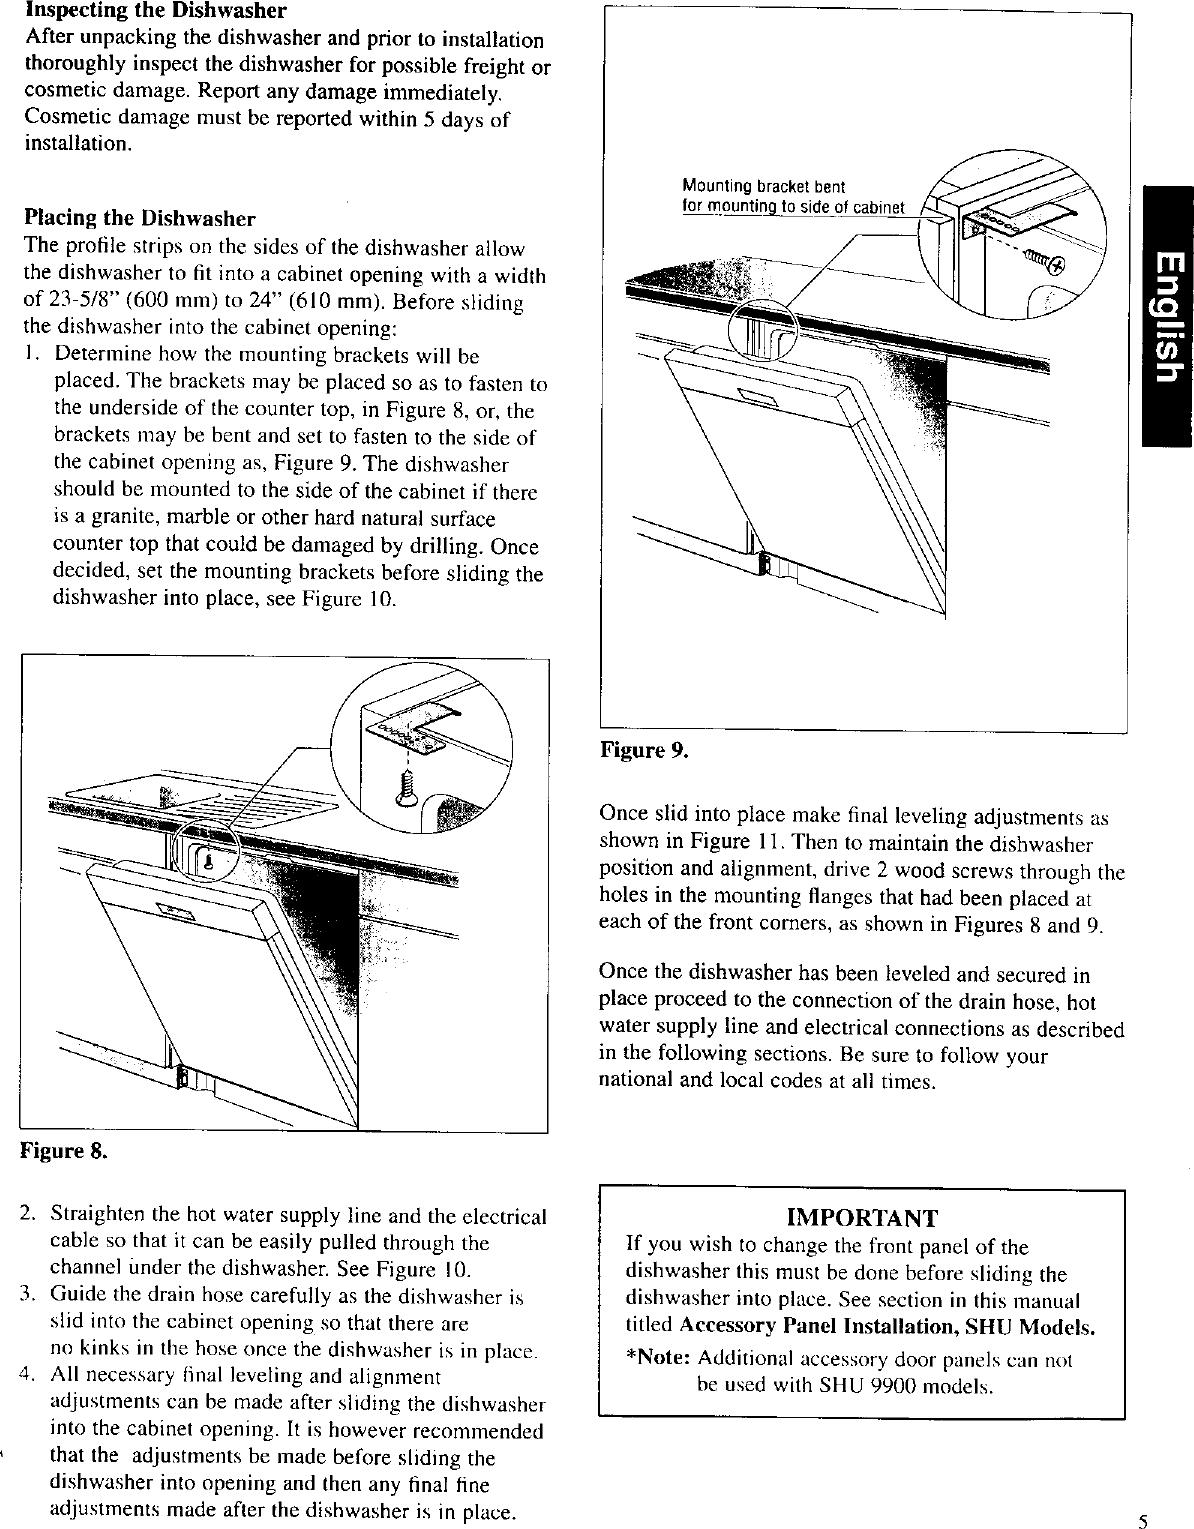 Bosch Dishwasher Manual L0020025 Wiring Diagram Page 5 Of 11